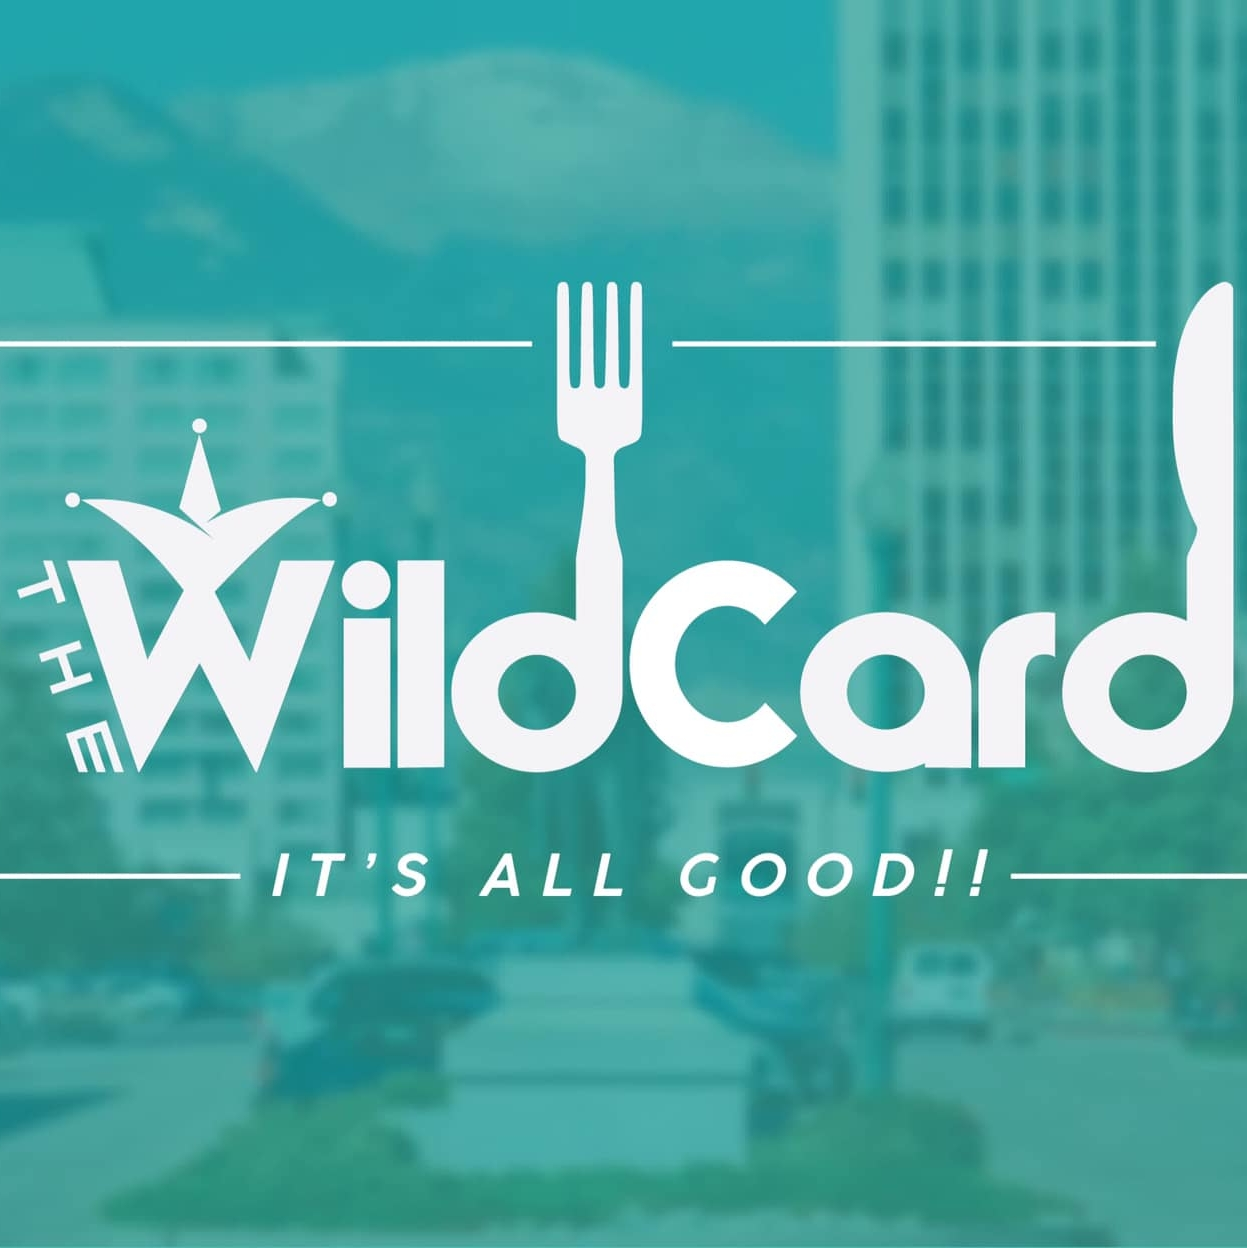 The Wild Card logo